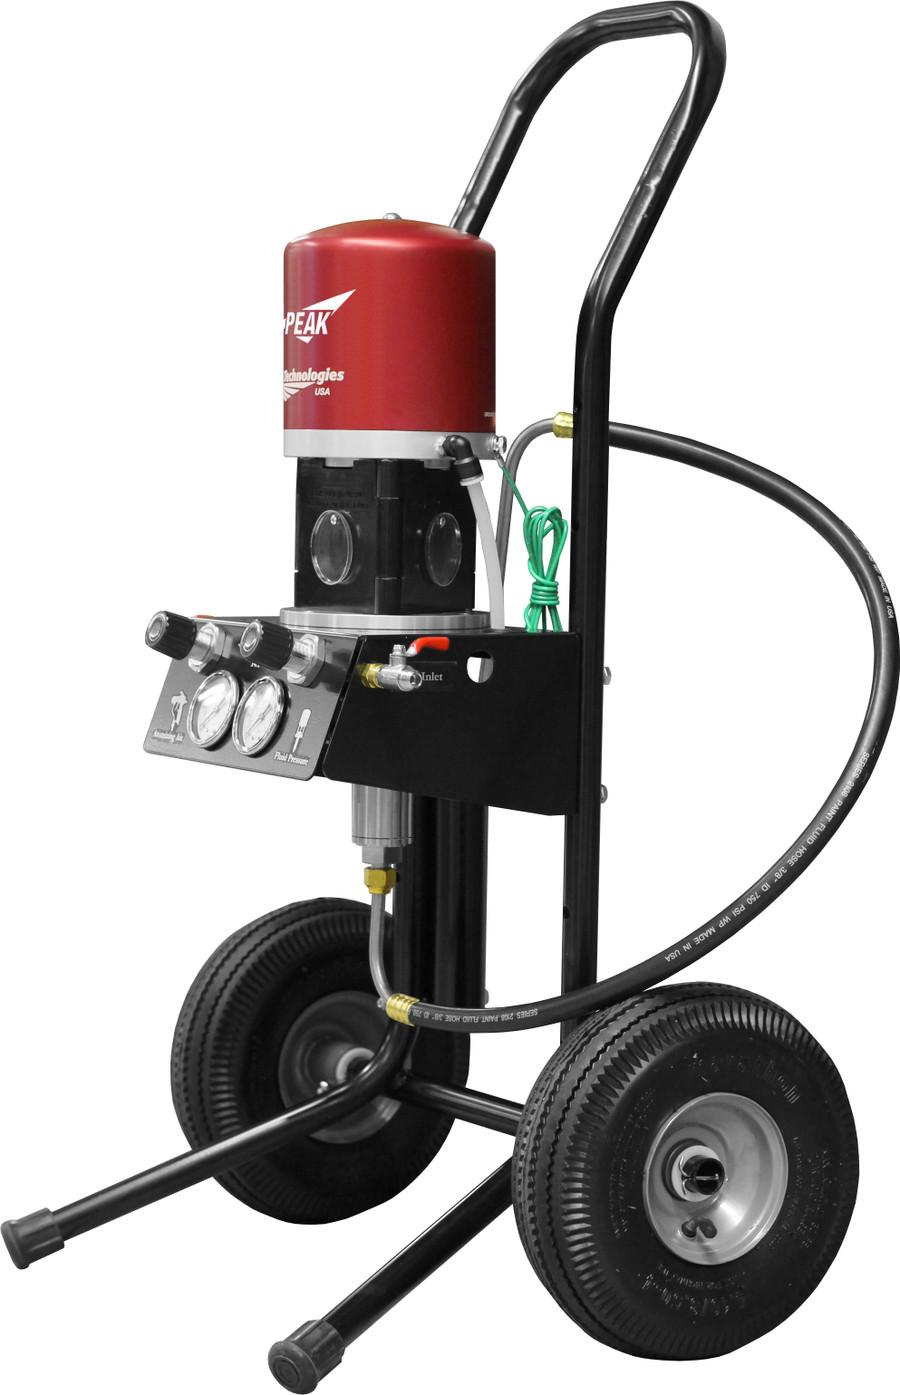 C.A. Technologies PK-OB14-C5-211 Air Assist Airless 14:1 Peak Performance Fine Finish Pump w/ Bobcat Gun